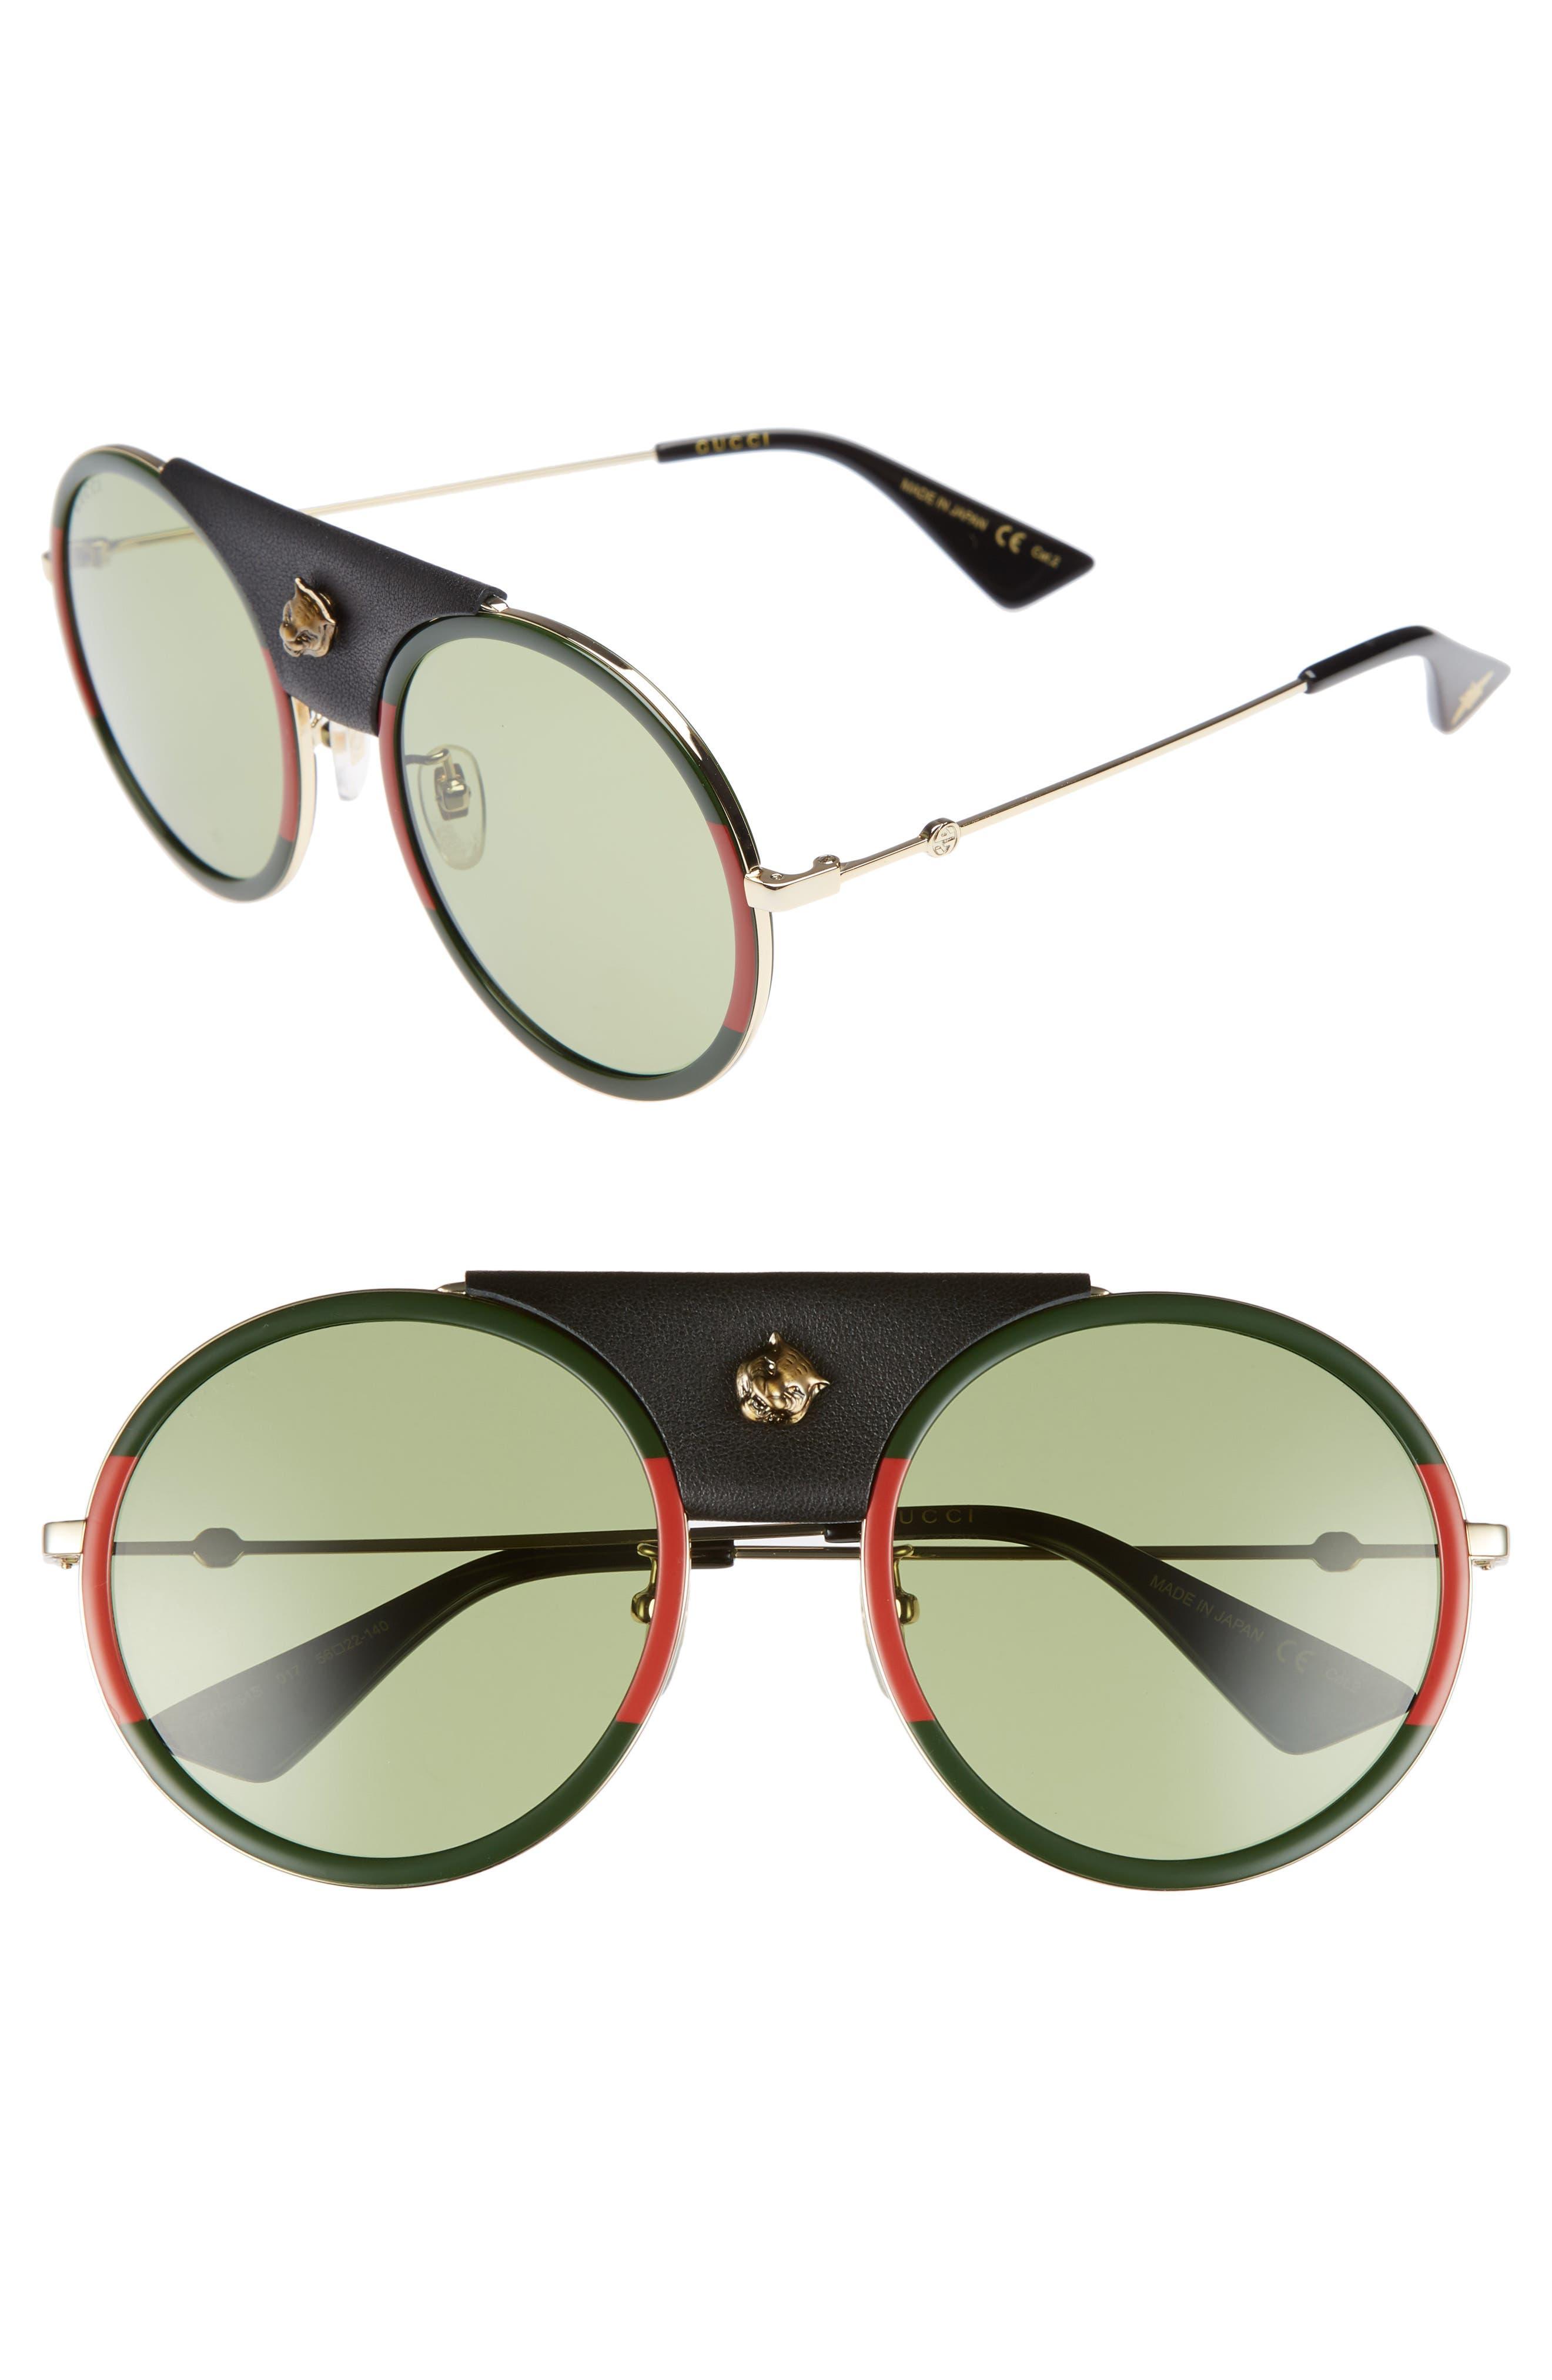 56mm Leather Bridge Aviator Sunglasses,                             Main thumbnail 1, color,                             Gold/ Black